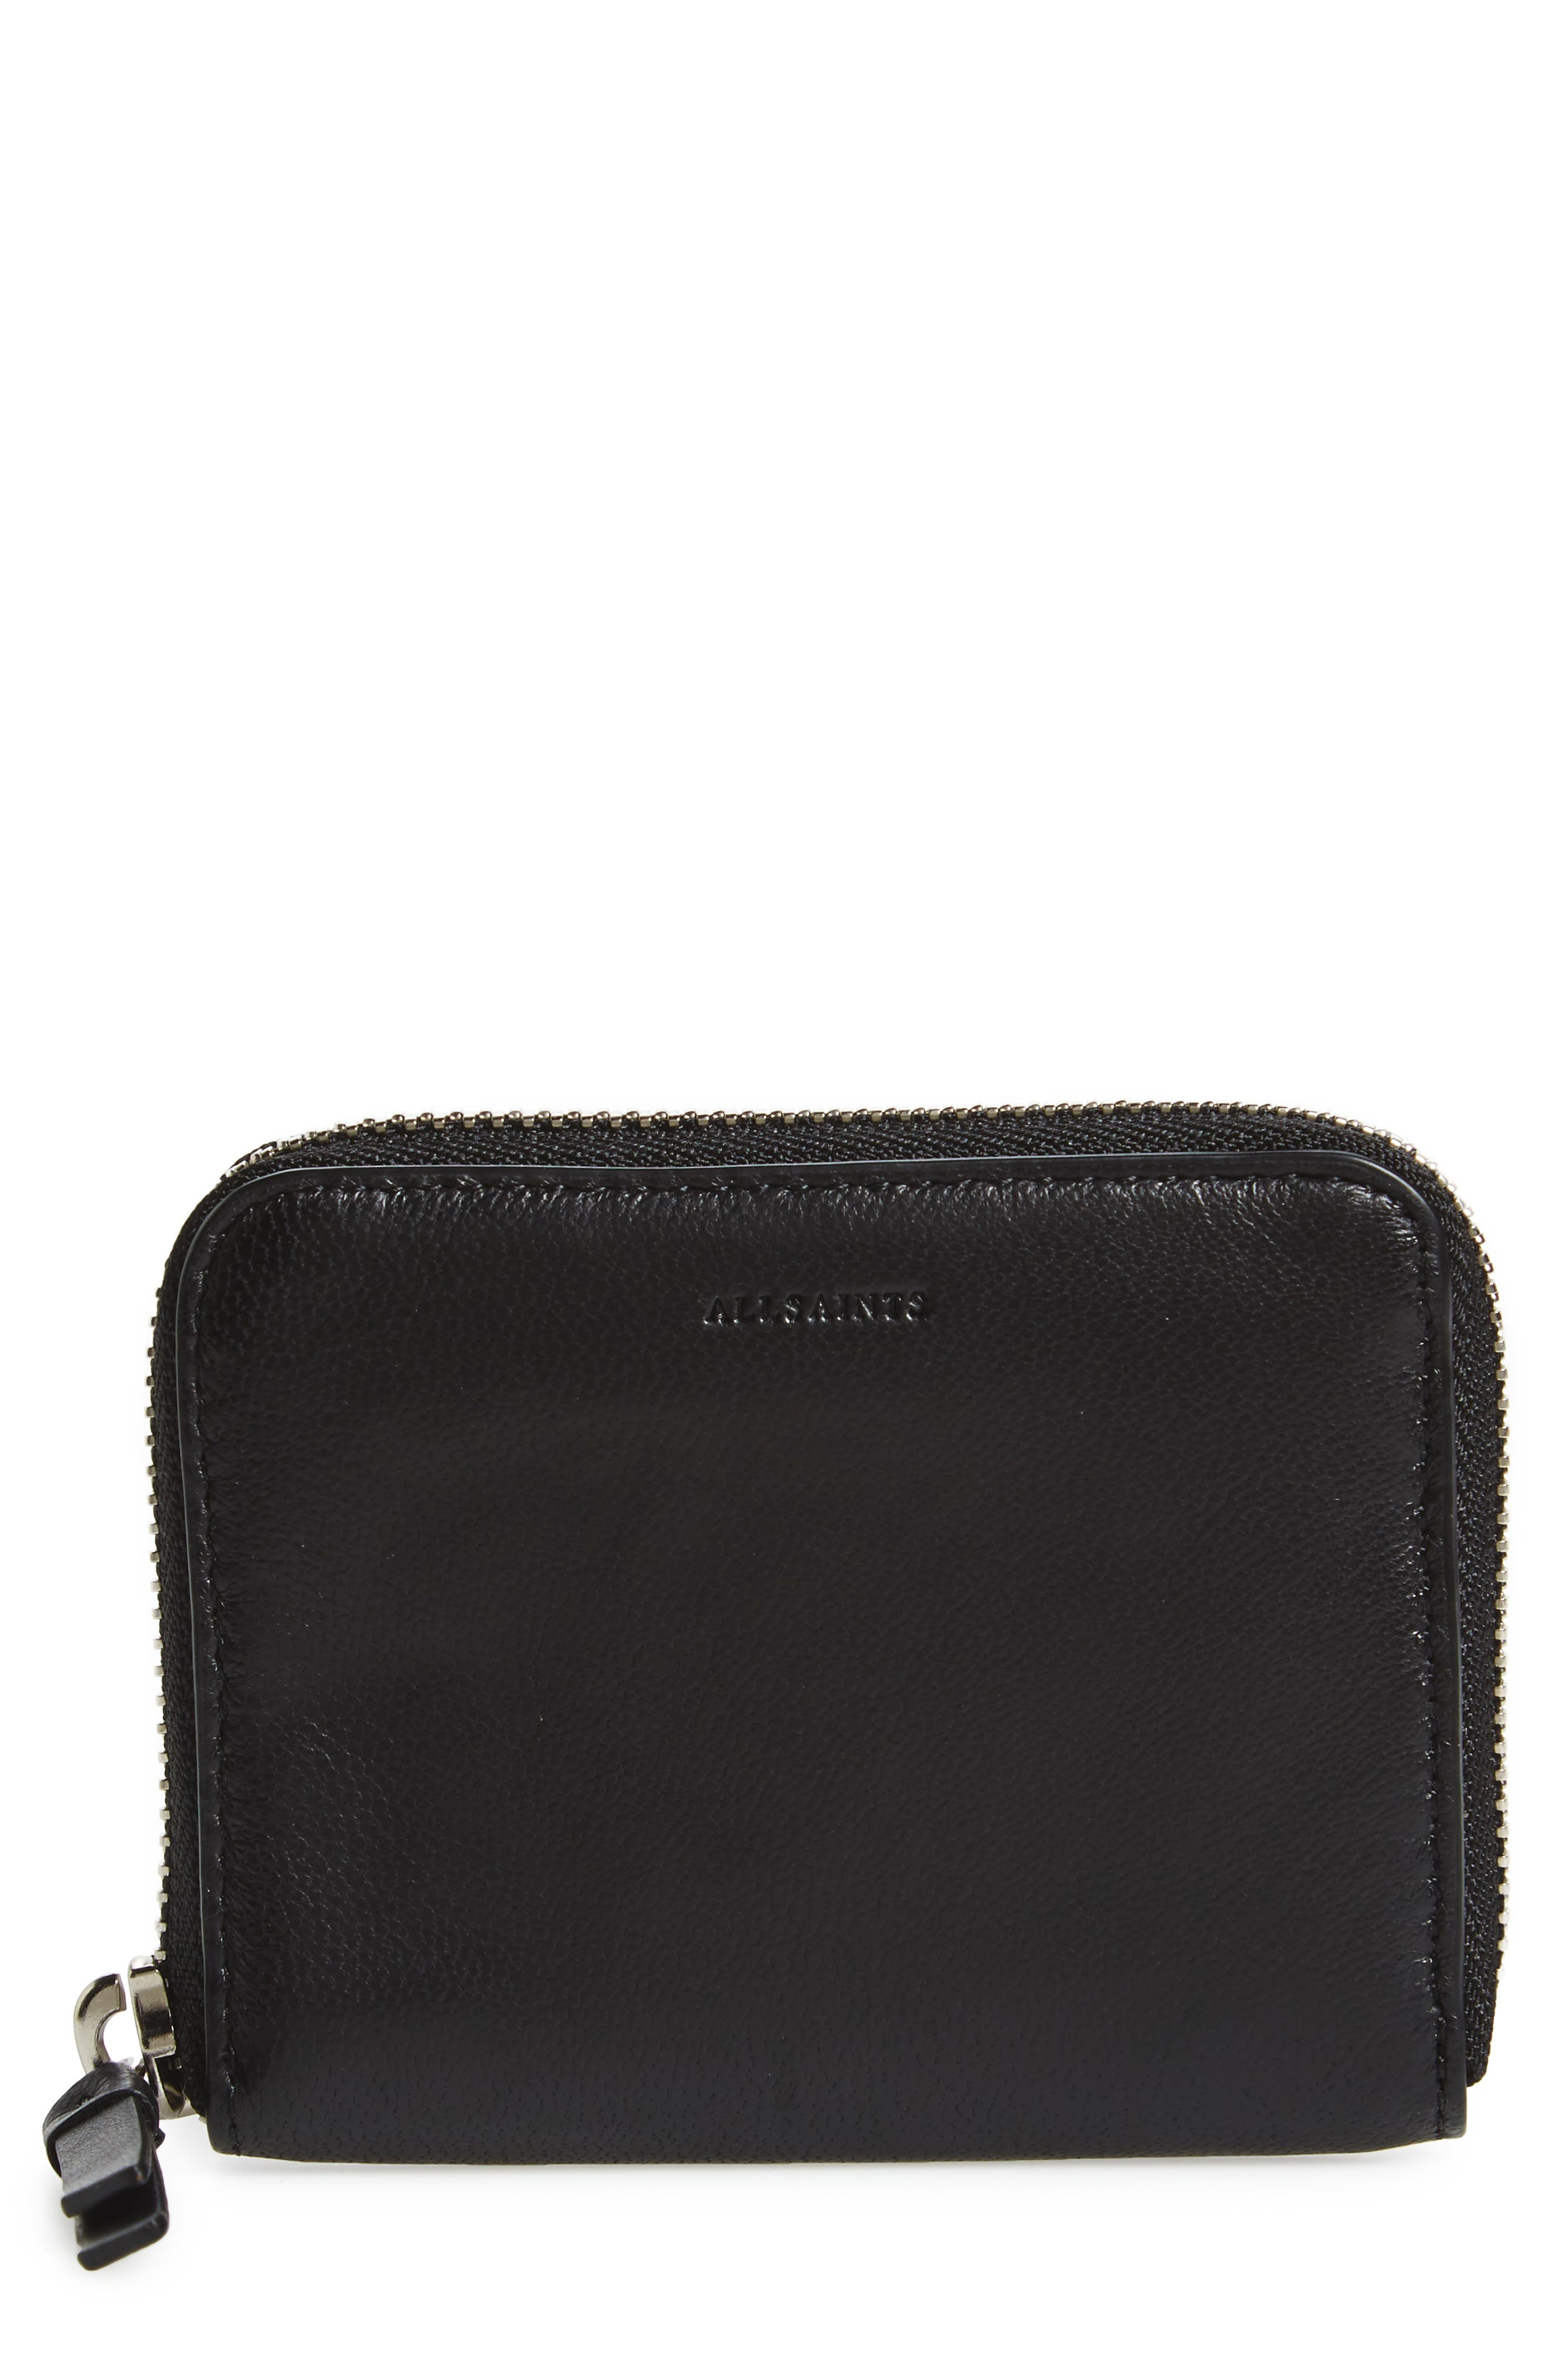 Alternate Image 1 Selected - ALLSAINTS Kanda Mini Zip Wallet